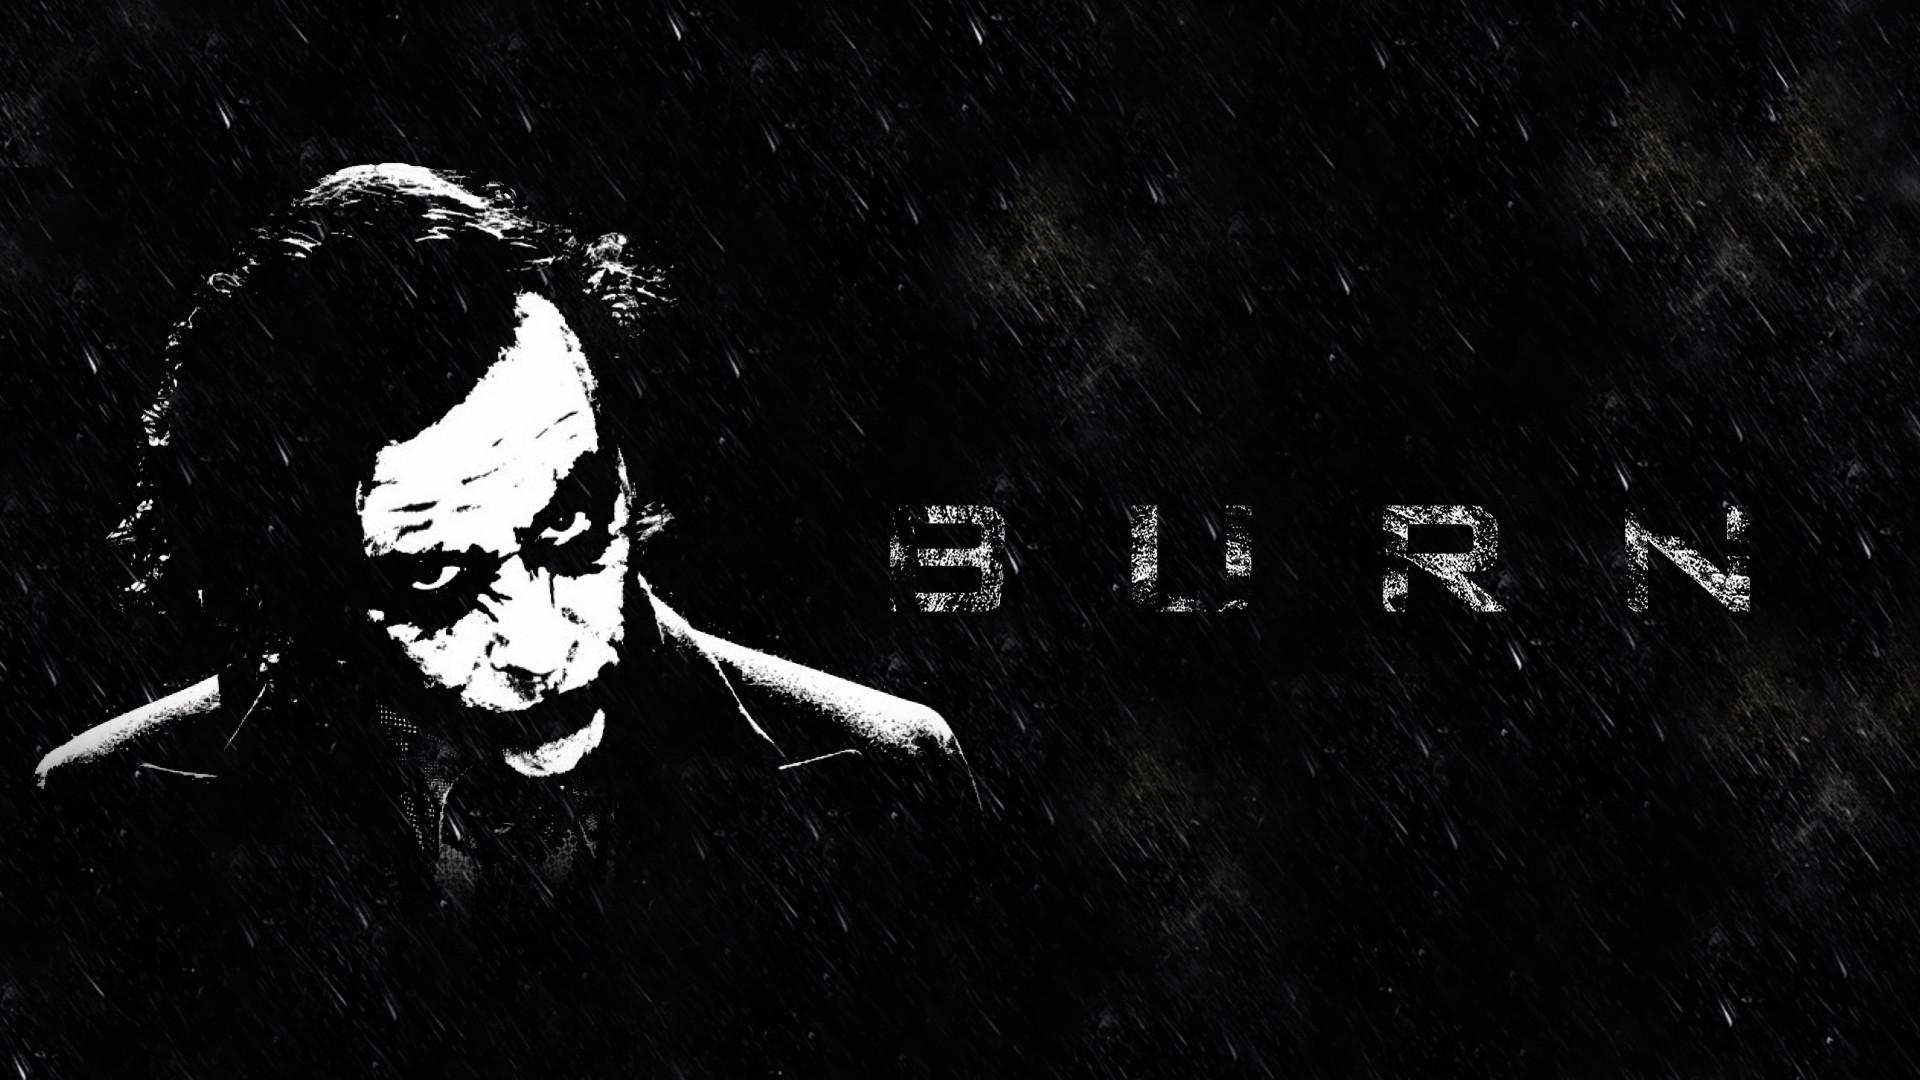 The Dark Knight HD Wallpapers and Backgrounds 1280×1024 The Joker Dark  Knight Wallpapers (53 Wallpapers) | Adorable Wallpapers | Desktop |  Pinterest | Dark …